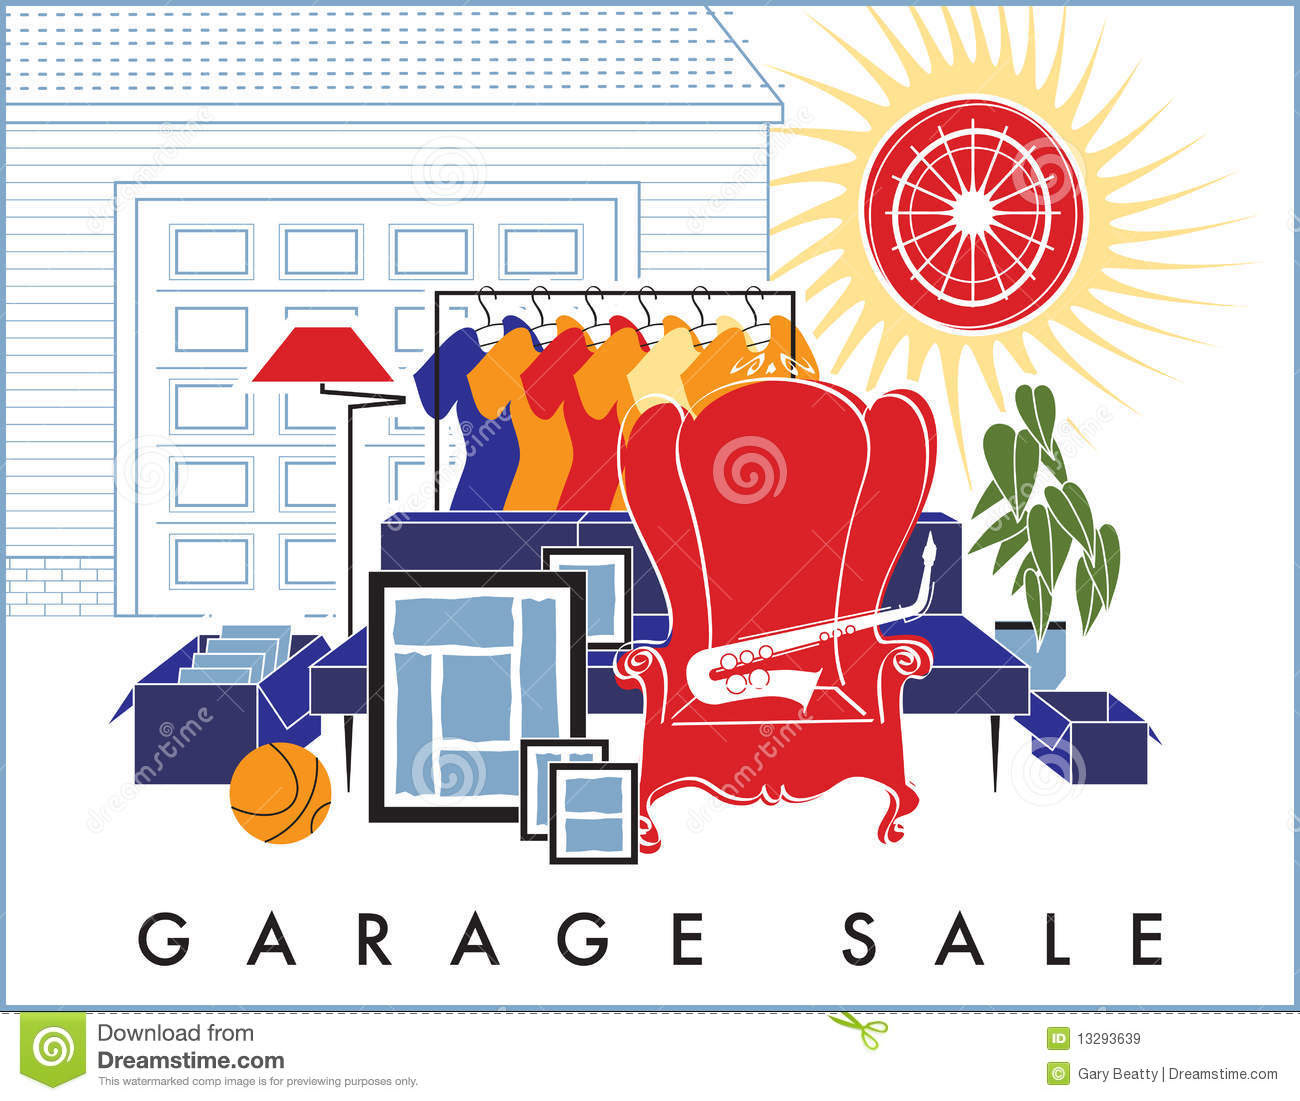 yard sale clip art garage sale junk royalty free stock images image KOT7EU clipart